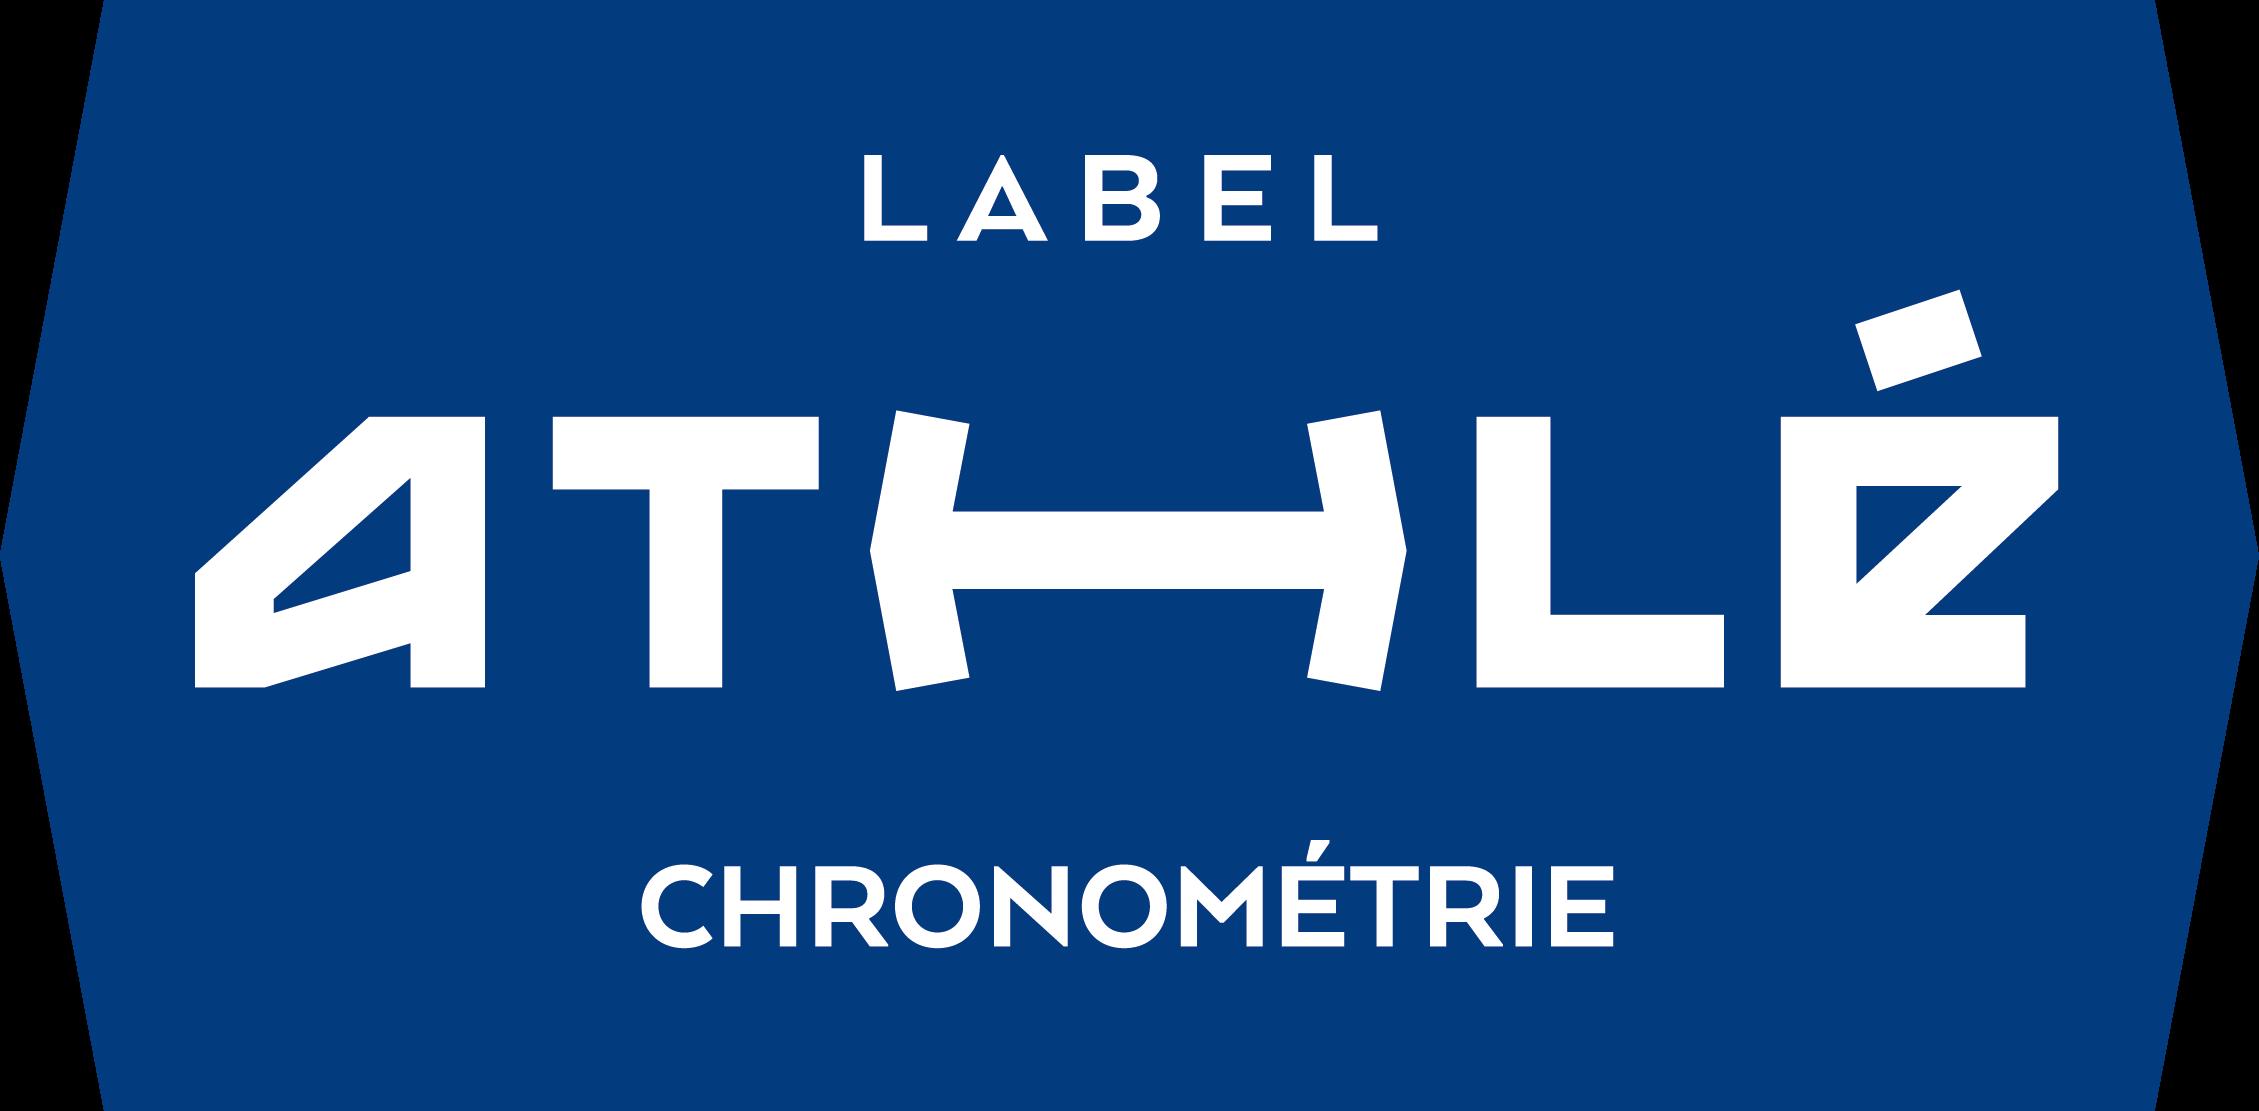 EVEN Outdoor label ffa chronometrie